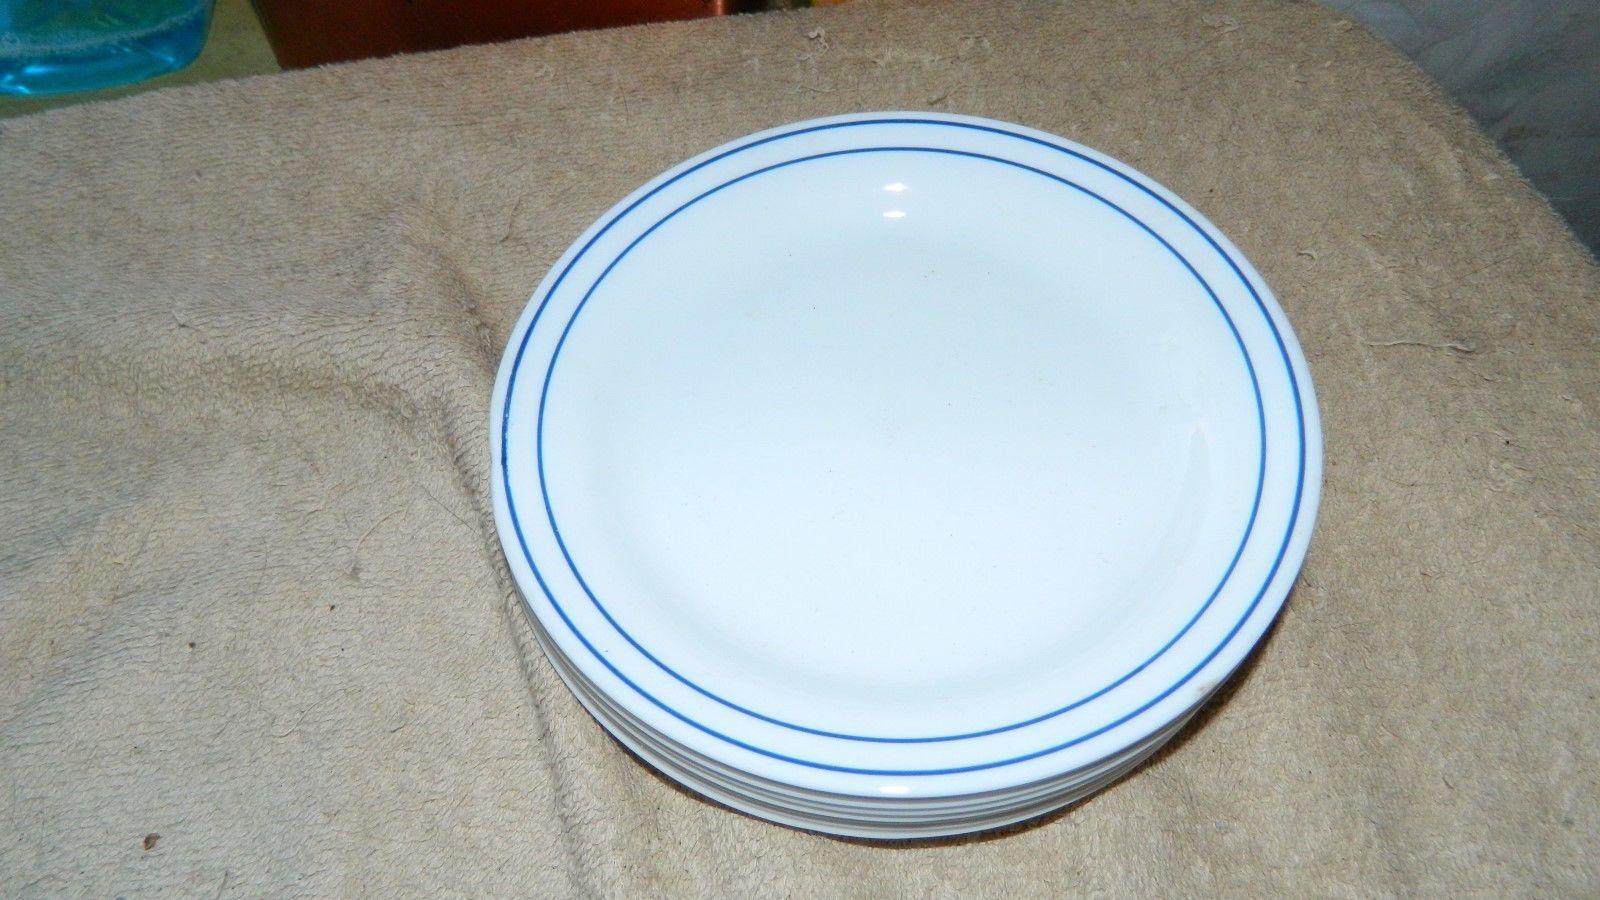 CORELLE WHITE WITH DOUBLE BLUE STRIPES BREAD /DESSERT PLATES x 7 FREE USA SHIP - $28.04